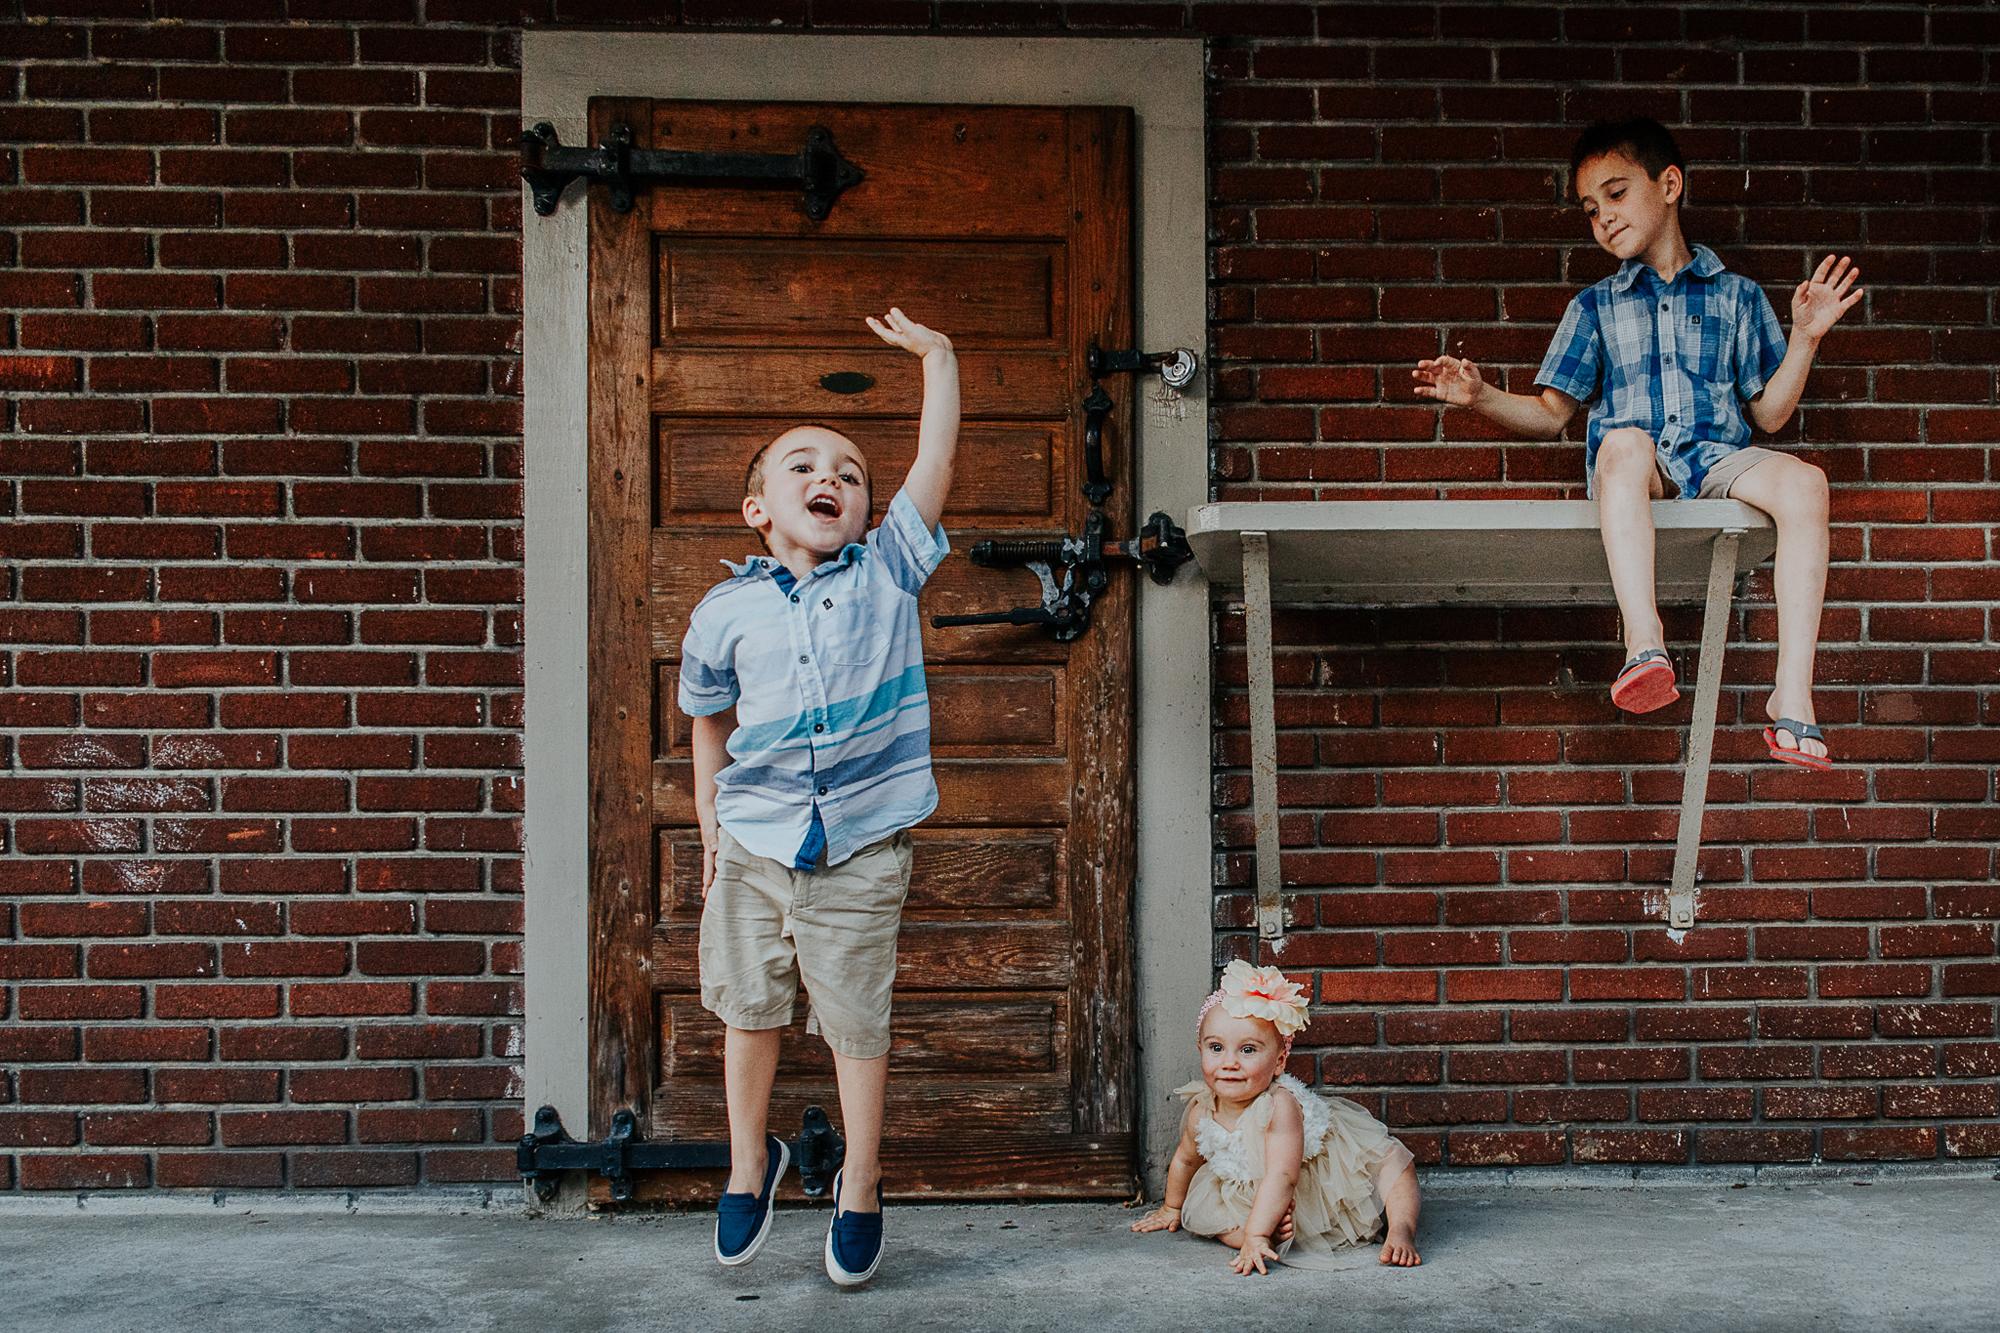 016-oldtown_alexandria_family_photography.jpg